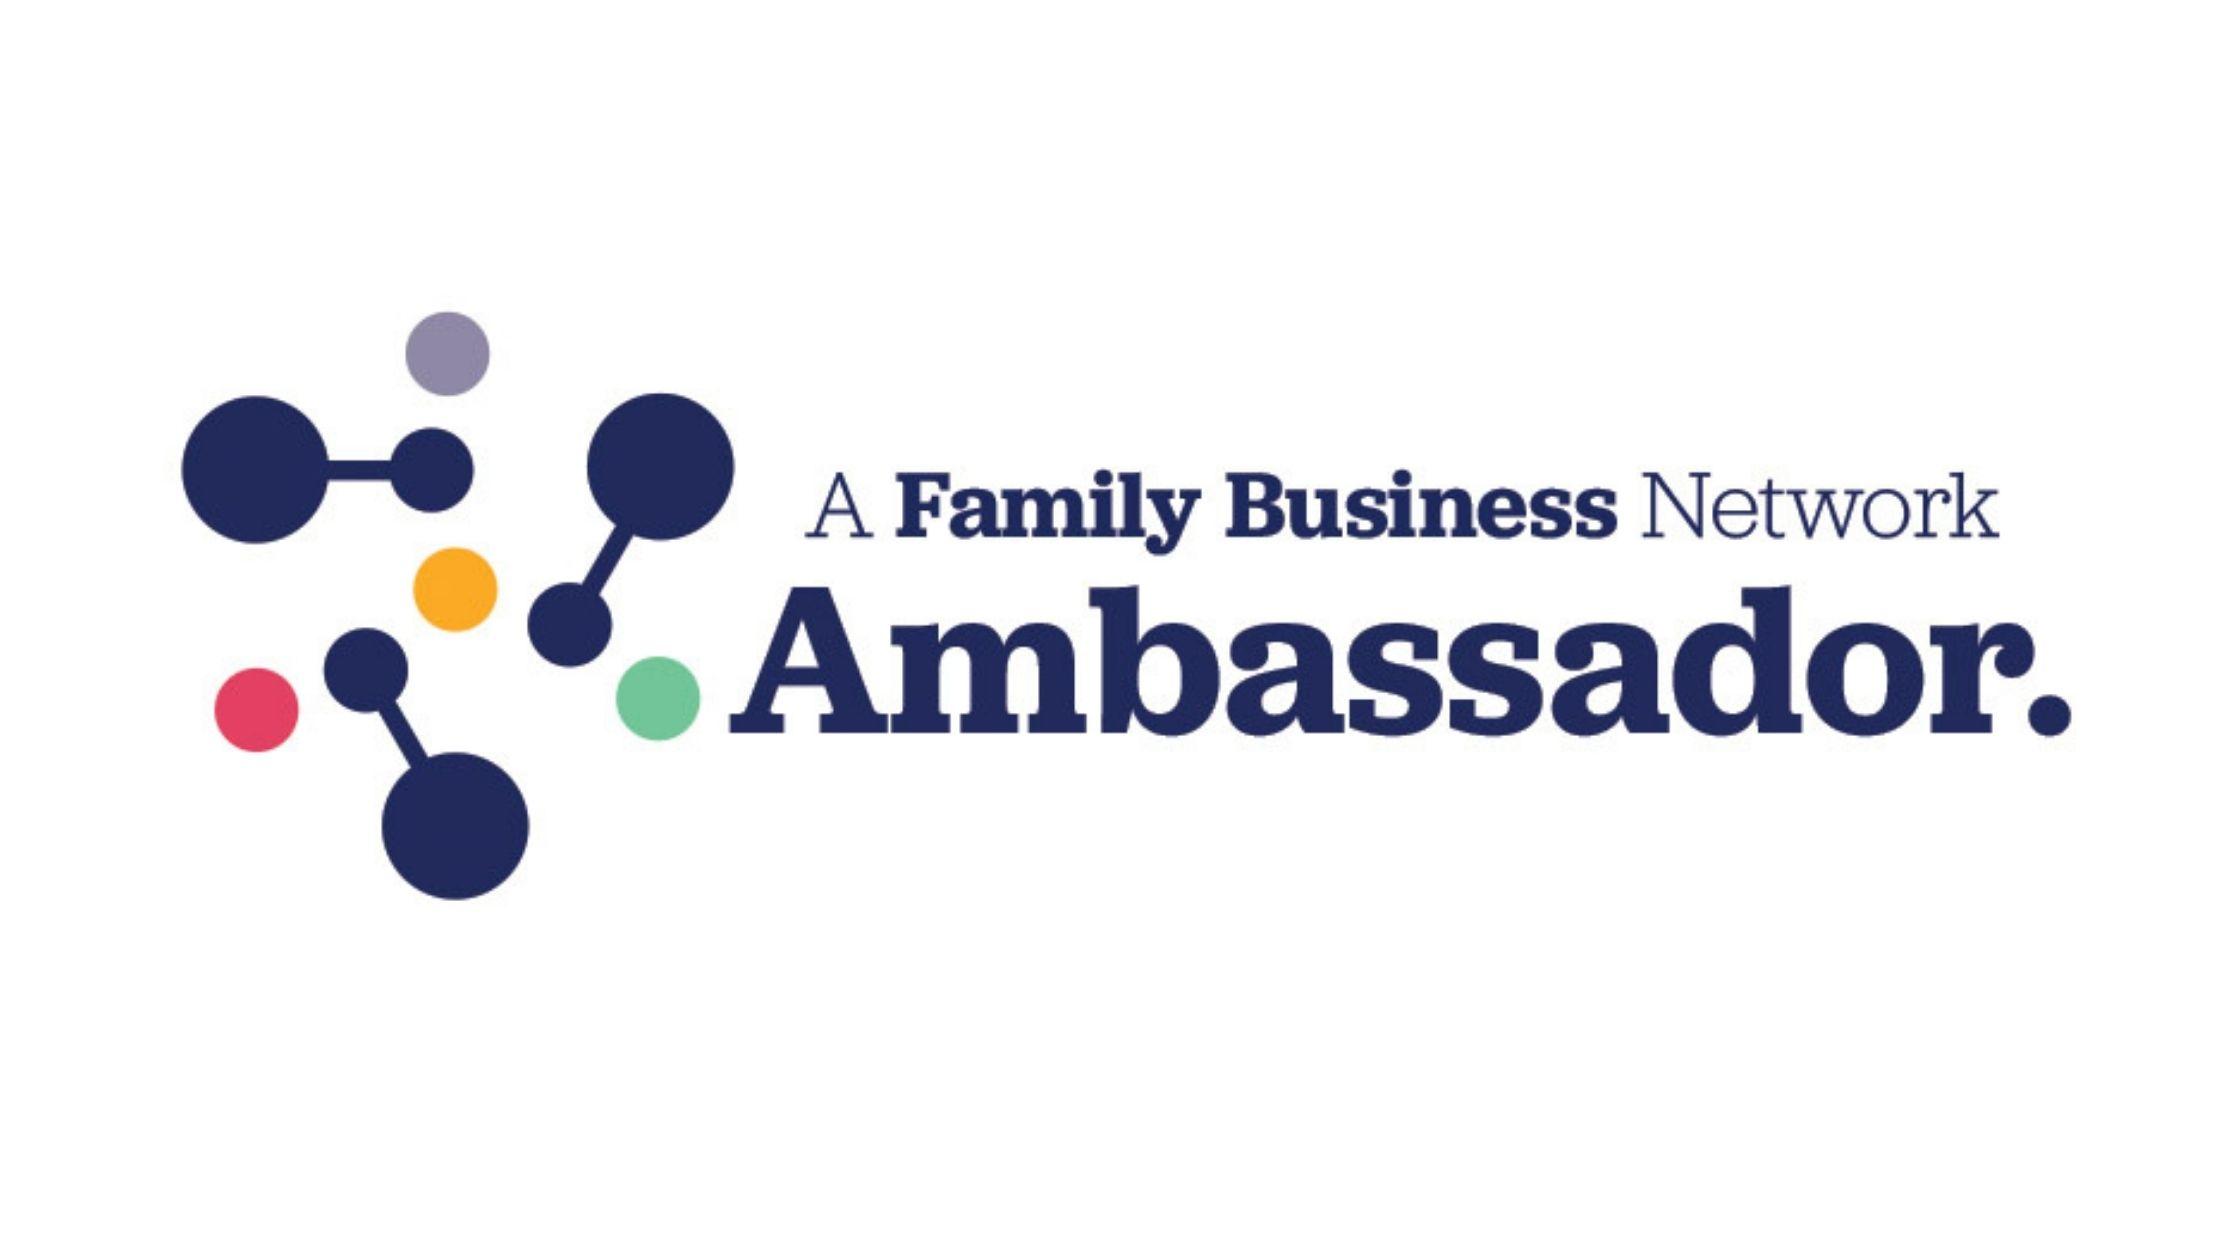 The Family Business Network Ambassador Logo